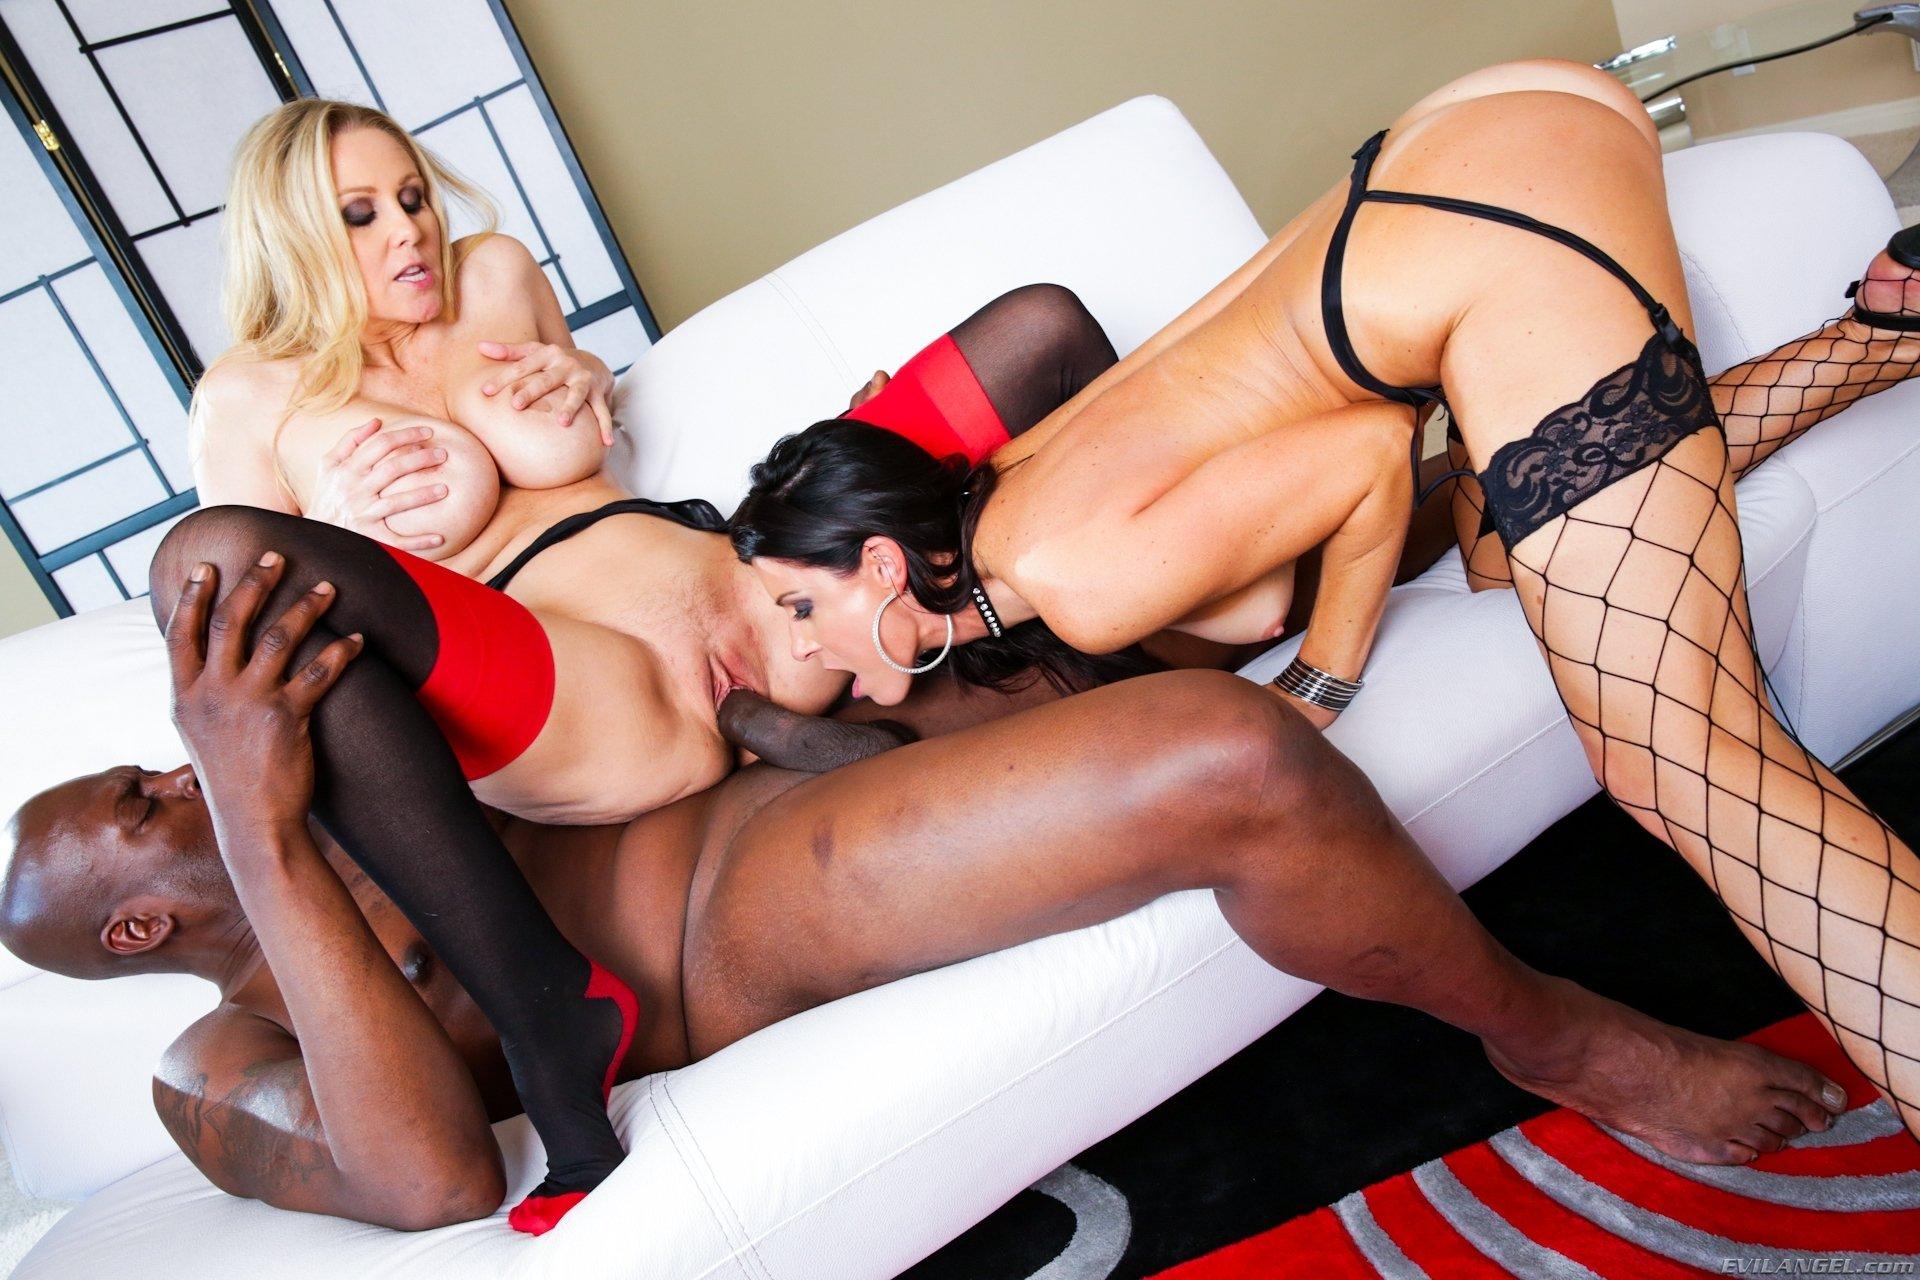 Girl Black Stockings Get Fuck